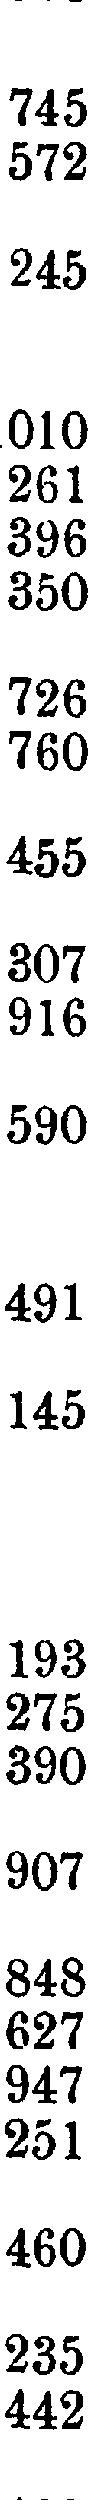 [ocr errors][merged small][ocr errors][ocr errors][ocr errors][ocr errors][merged small][merged small][ocr errors][ocr errors][ocr errors][ocr errors]